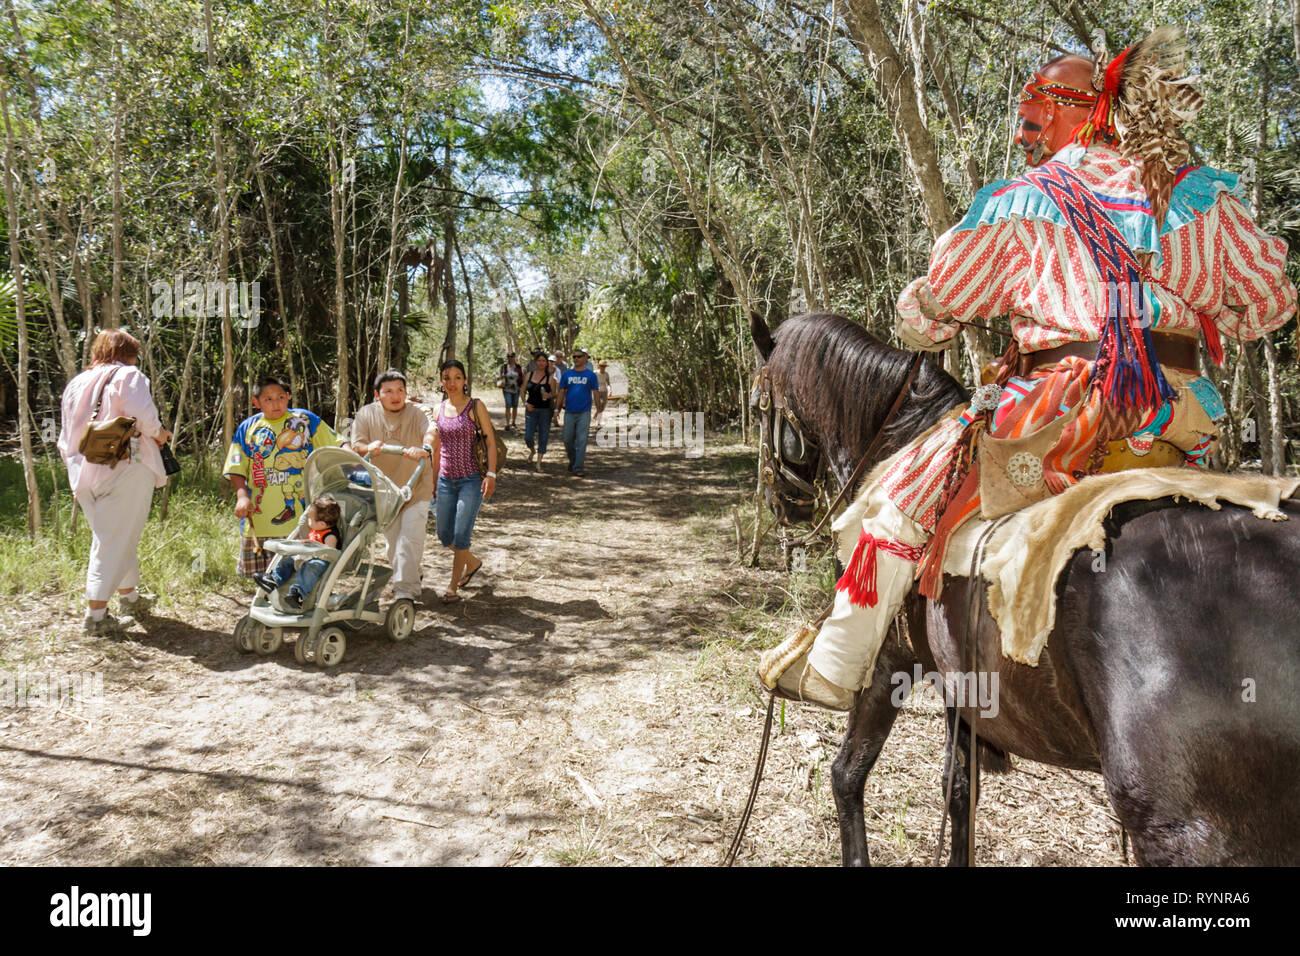 Florida Big Cypress Seminole Indian Reservierung Billie Swamp Safari Big Cypress Shootout jährliche Ereignis indianischer Krieger ho Stockbild